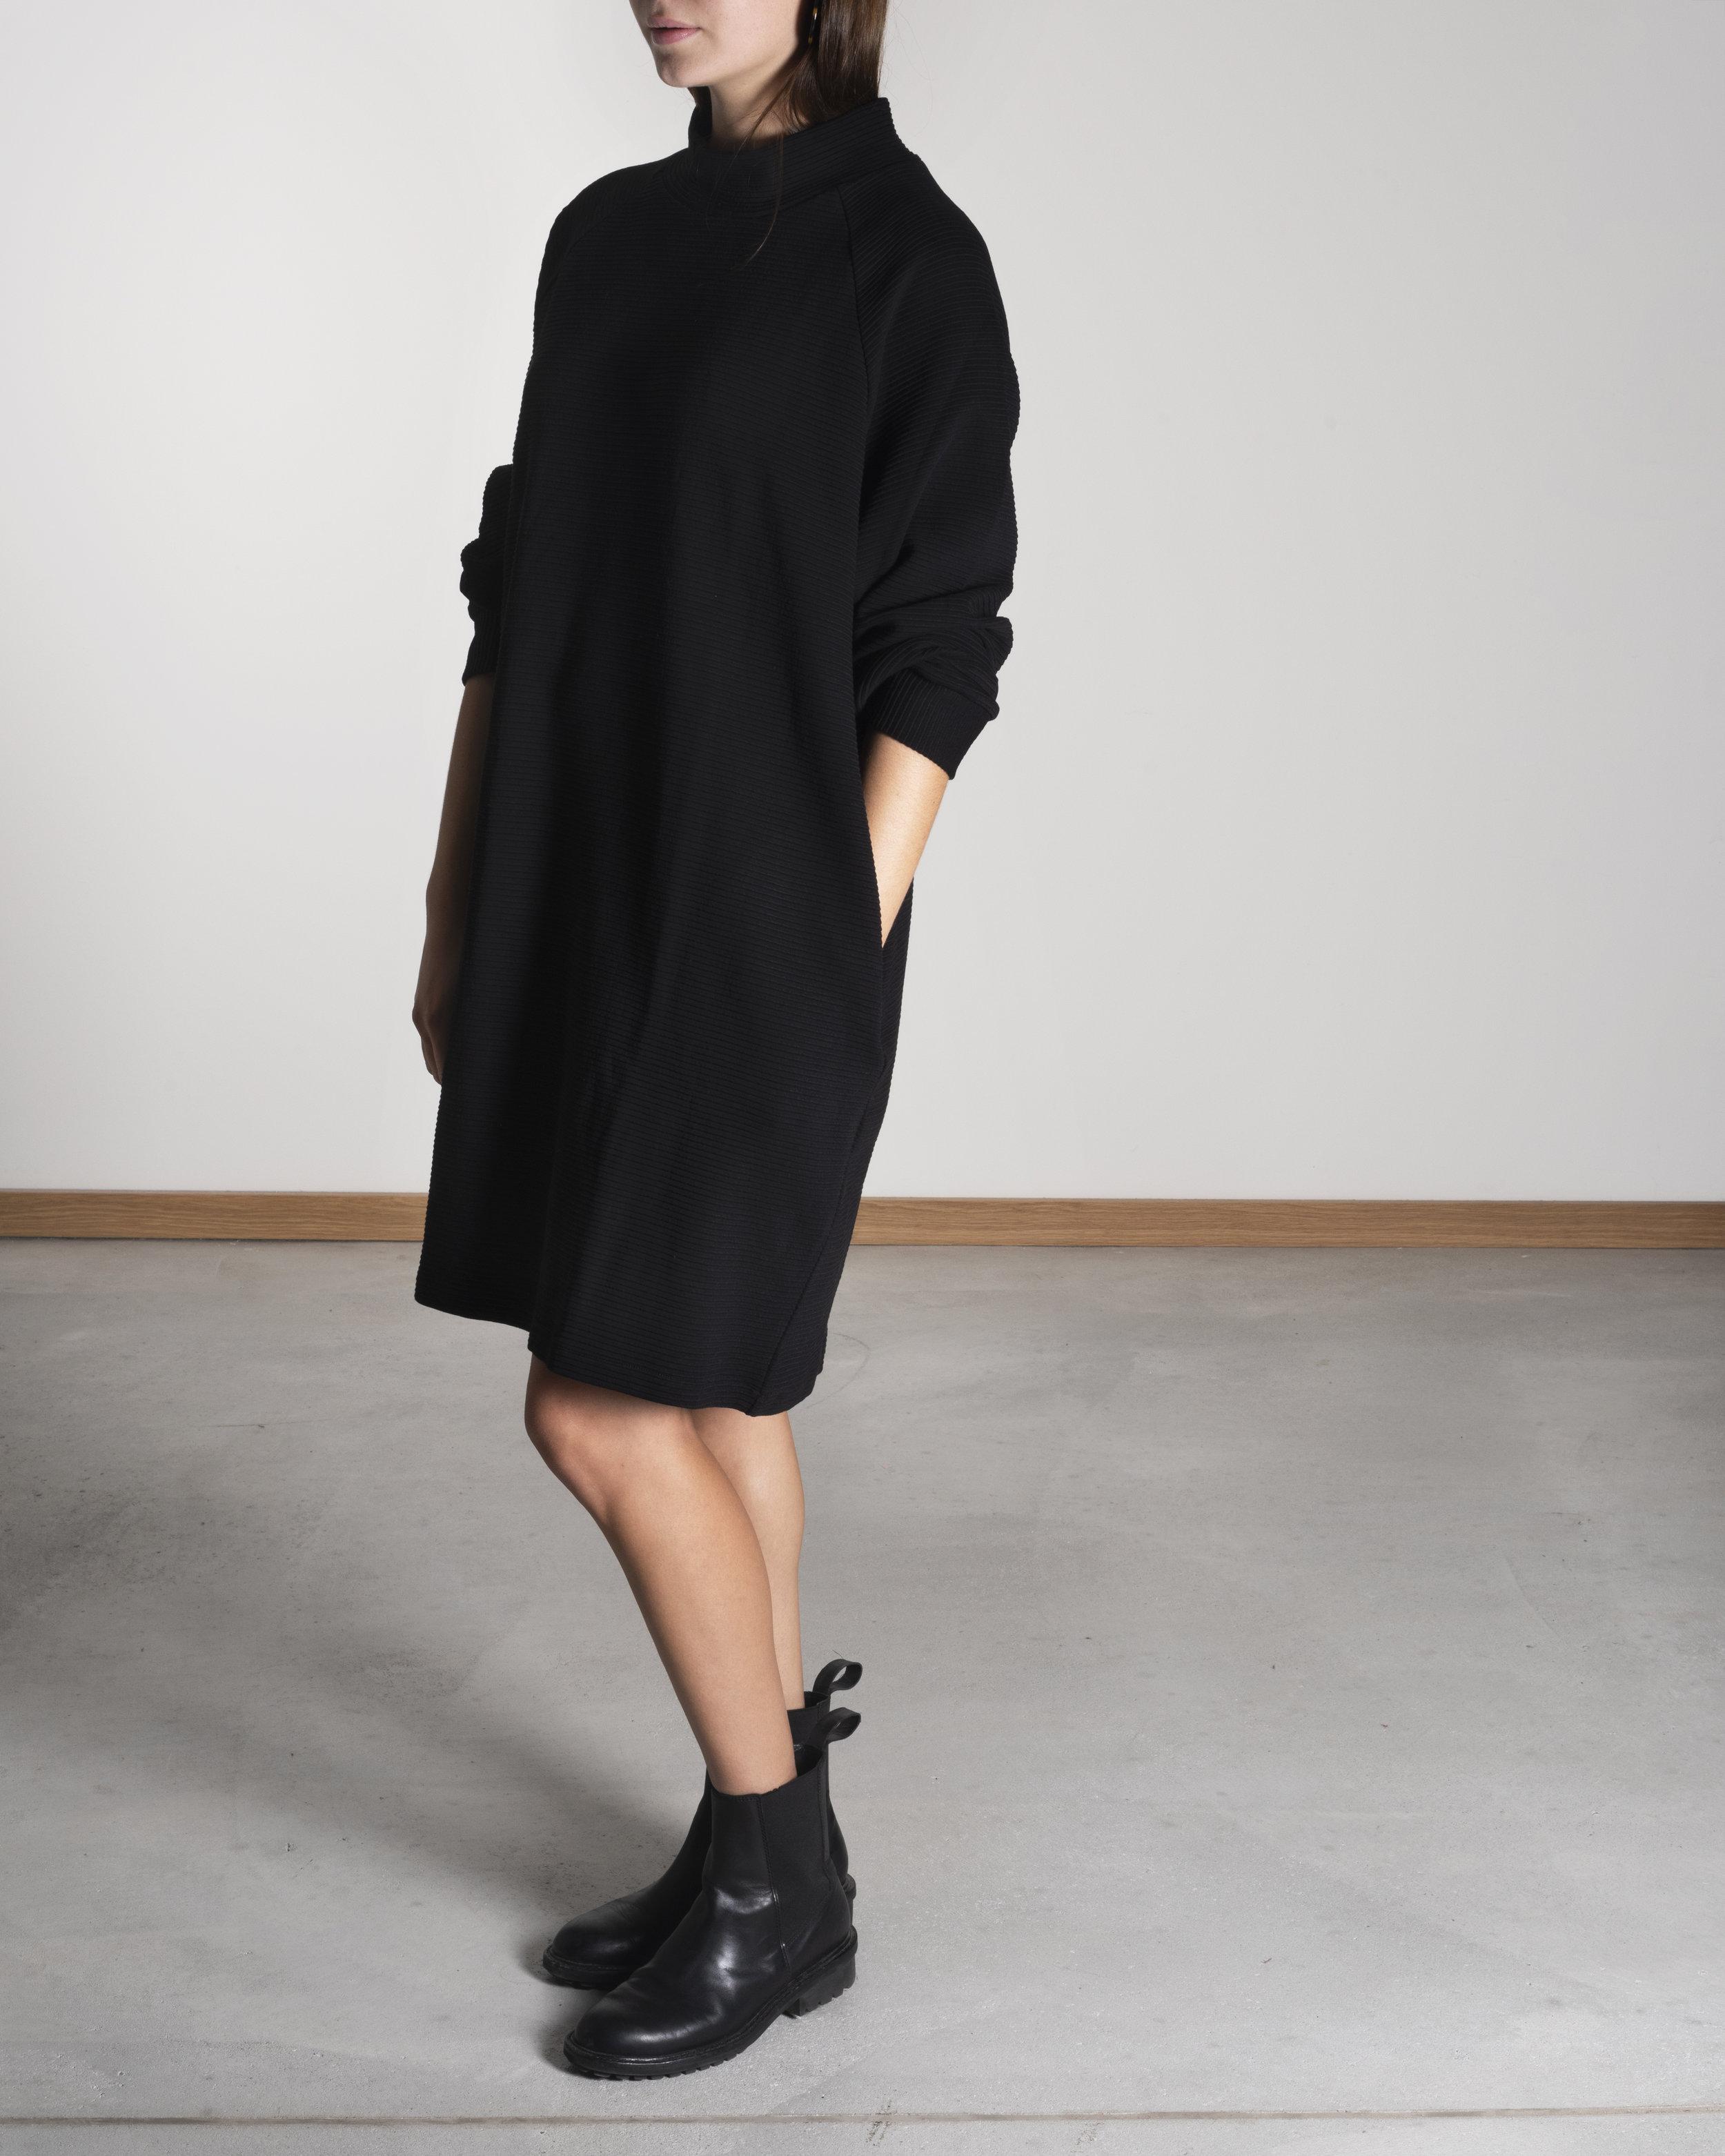 MOMO dress ripp black .jpg